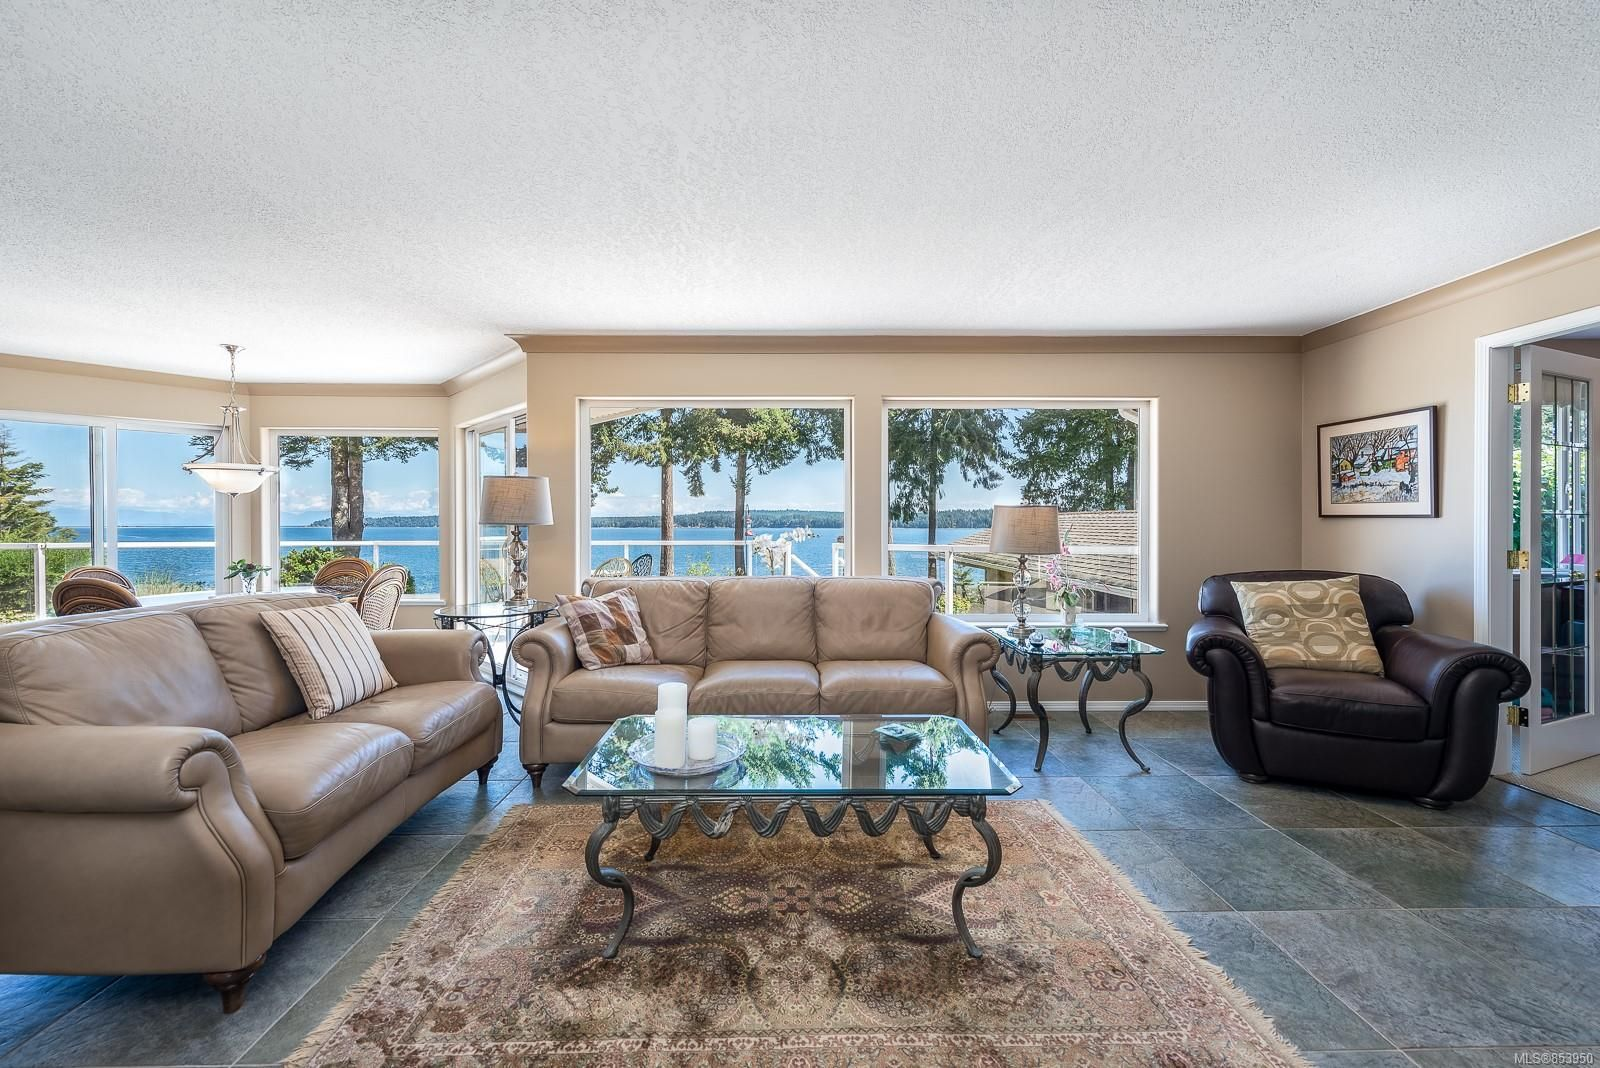 Photo 4: Photos: 5880 GARVIN Rd in : CV Union Bay/Fanny Bay House for sale (Comox Valley)  : MLS®# 853950